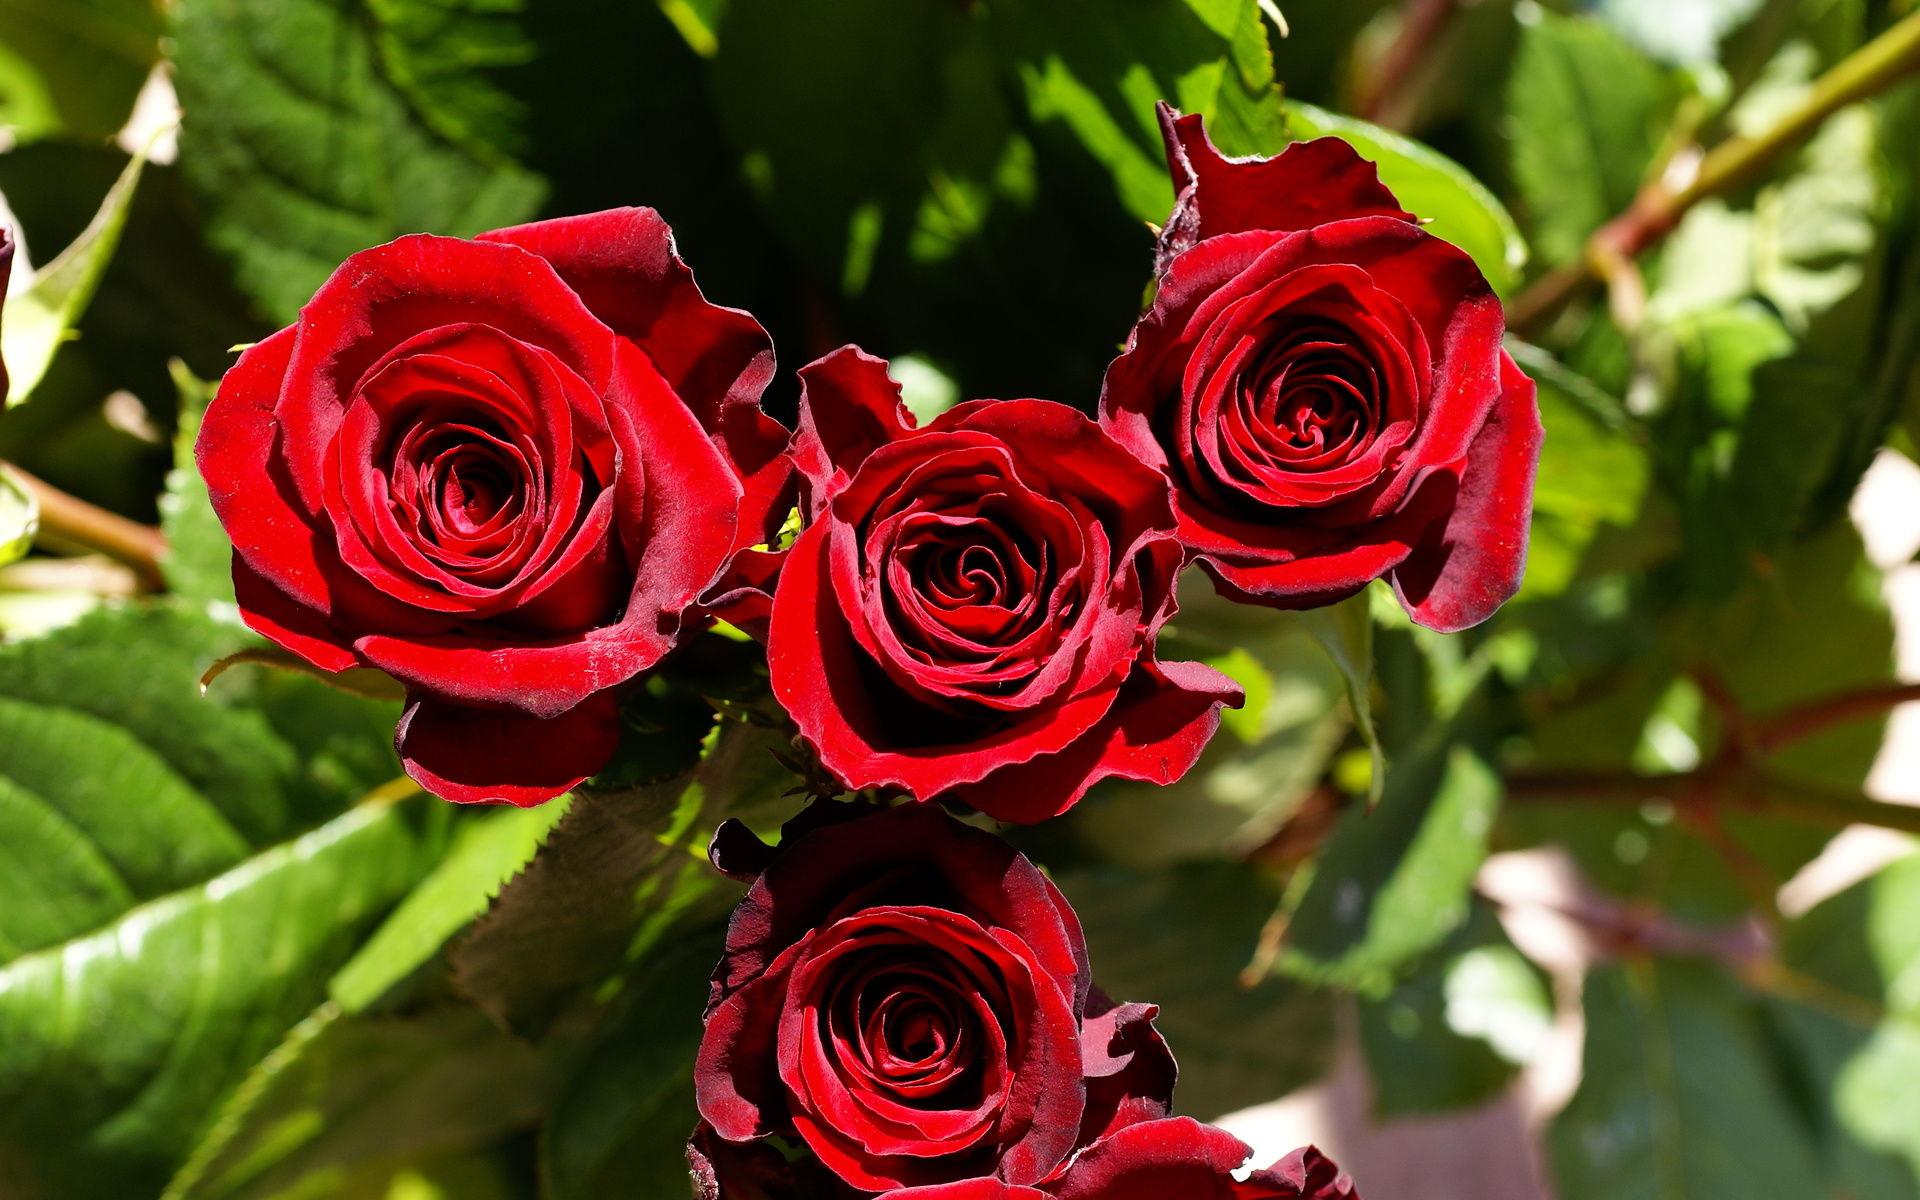 بالصور صور اجمل الورود , اجمل الورود واحلاها 3662 2